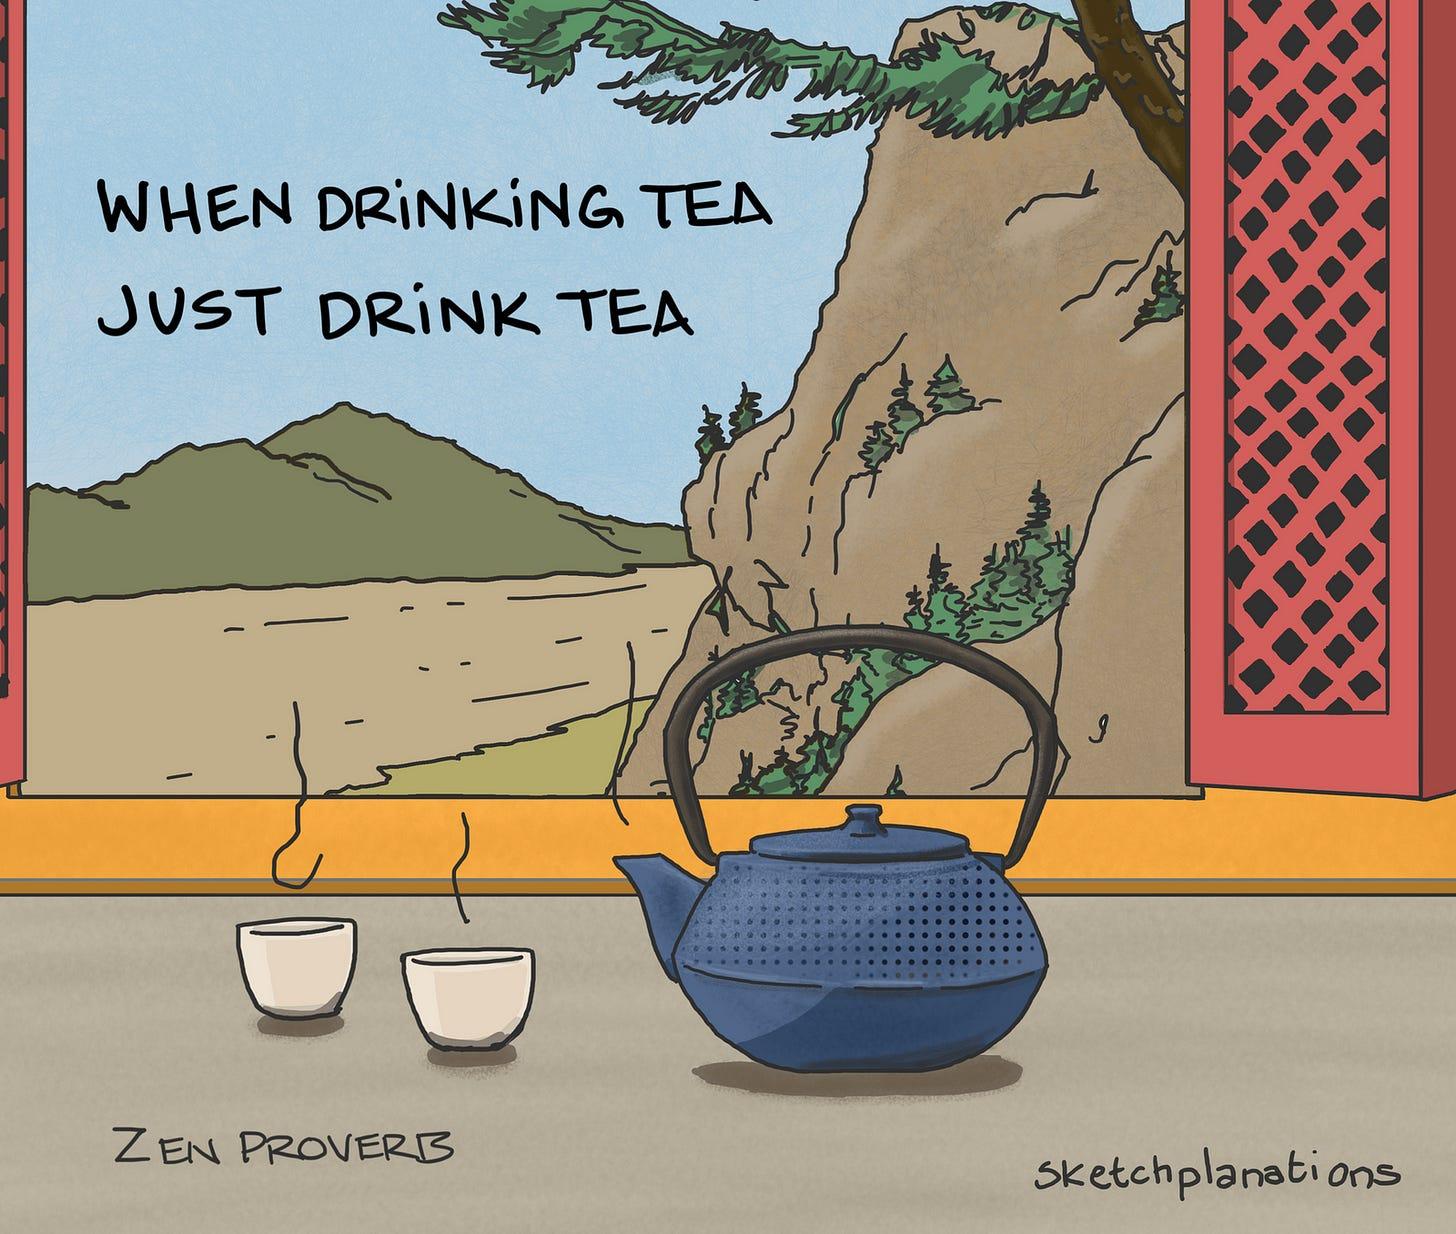 When drinking tea, just drink tea - Sketchplanations